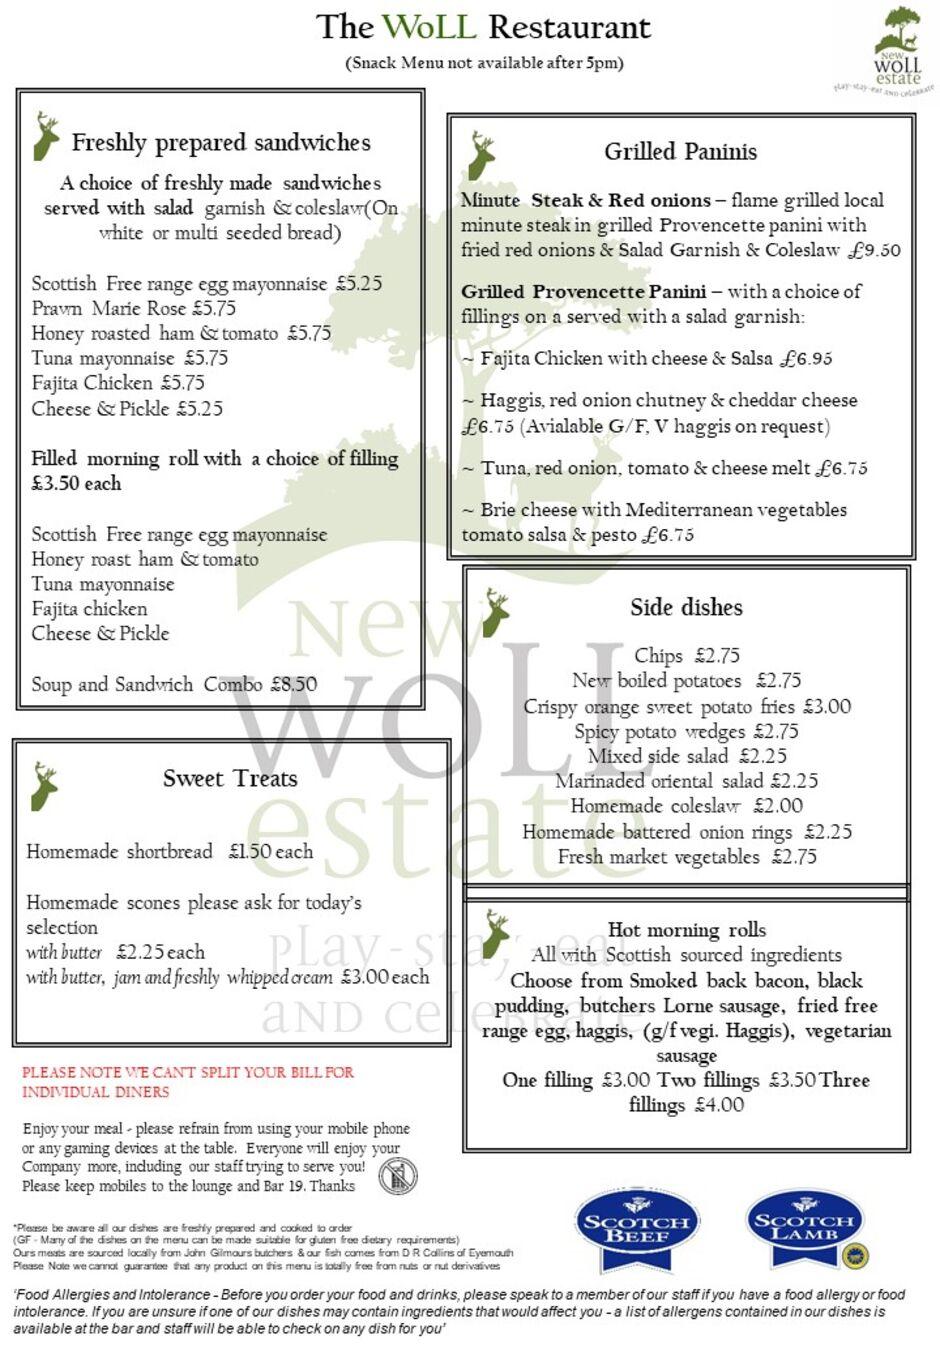 Wol Restaurant snack menu